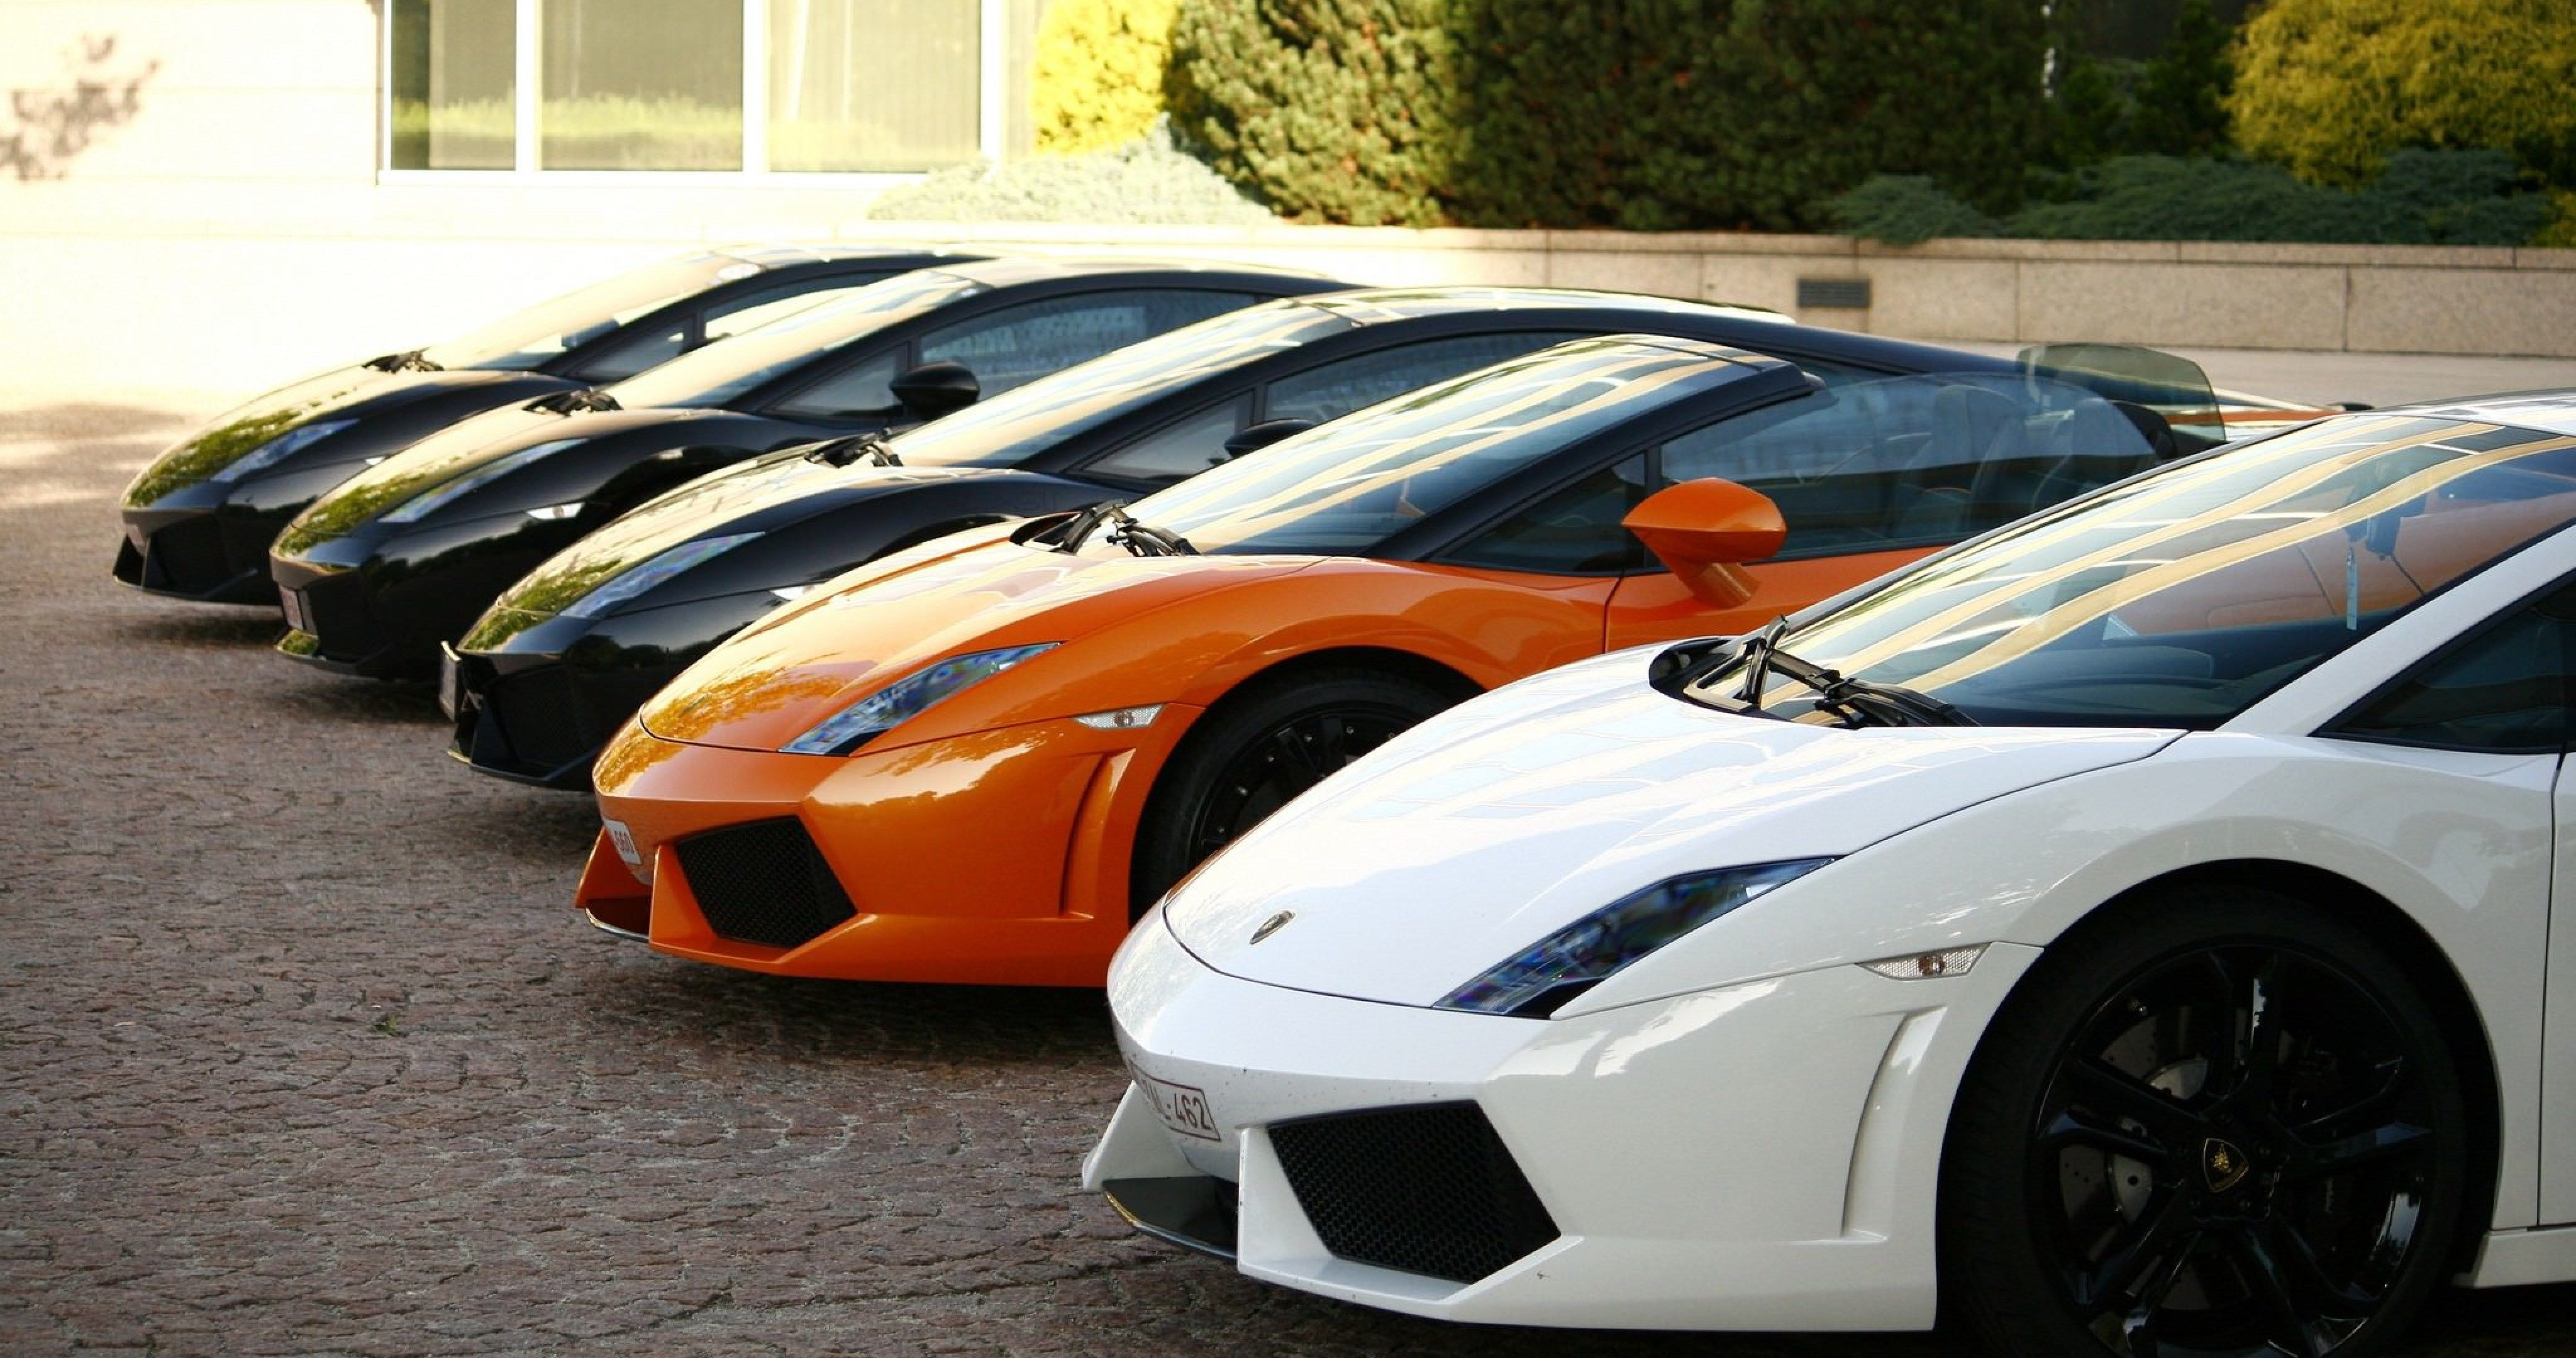 Lamborghini In All Colors 4k Ultra Hd Wallpaper